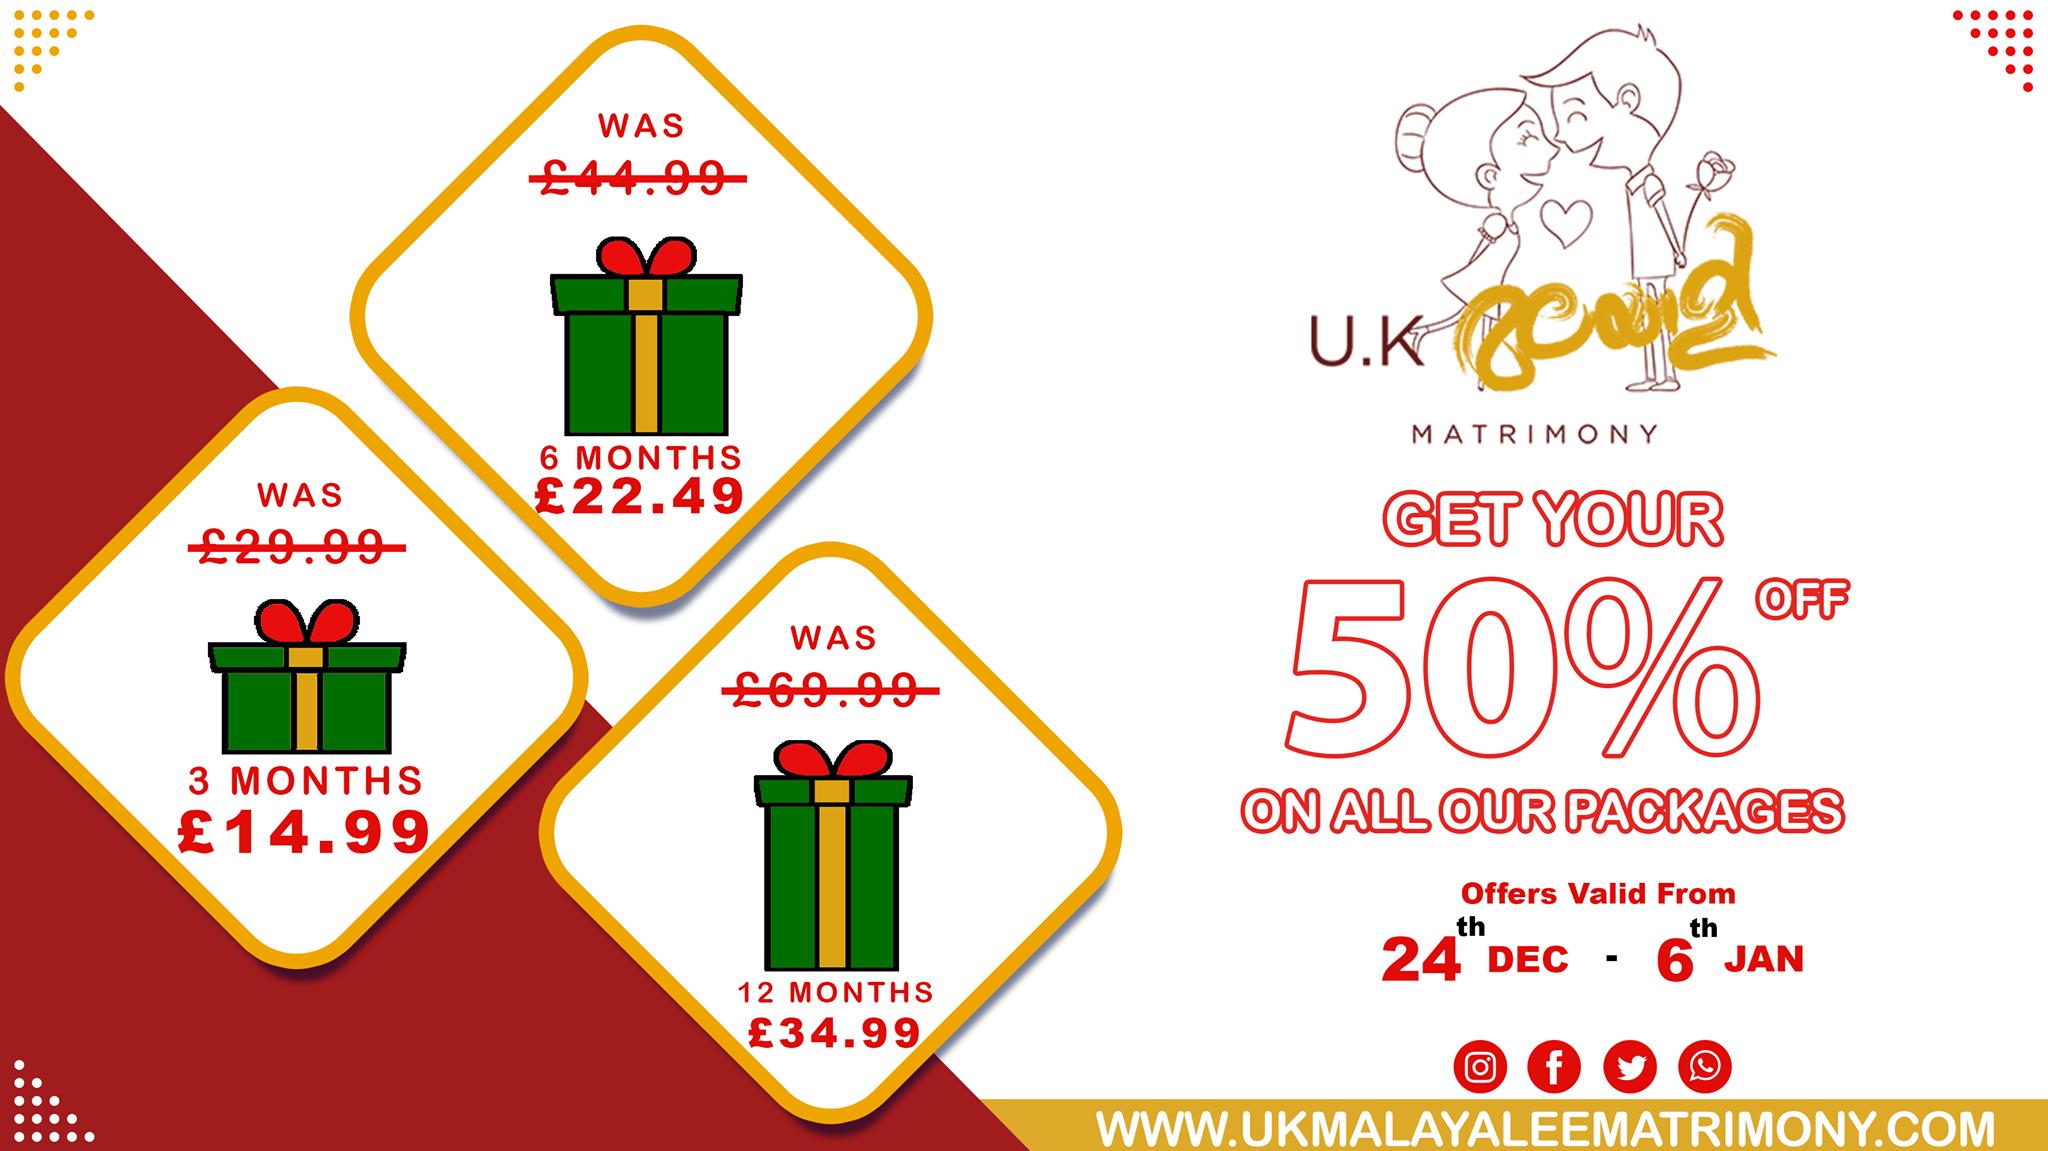 Merry Christmas from UK Malayalee Matrimony